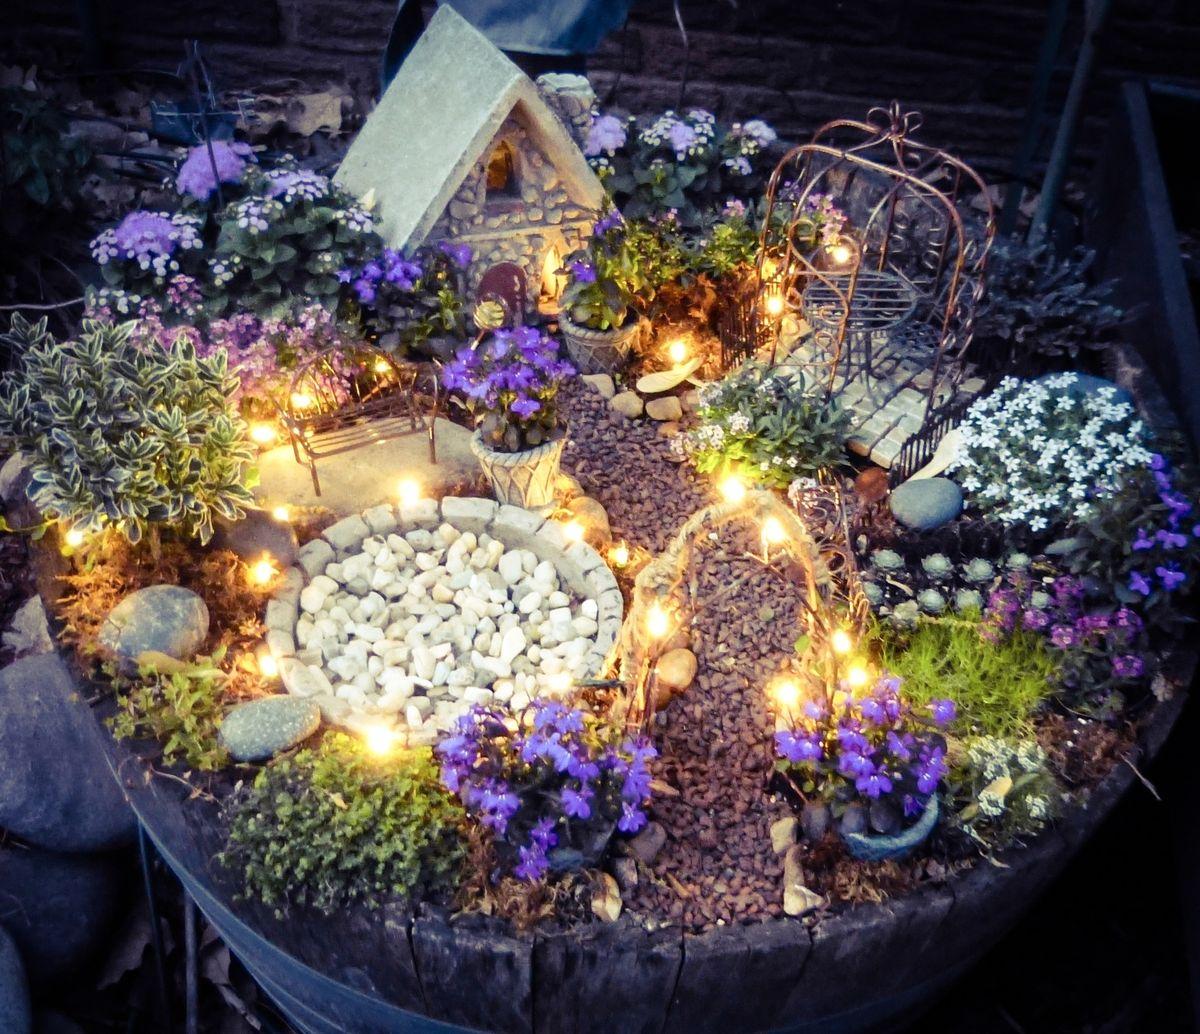 12-some-enchanted-evening-fairy-garden-ideas-homebnc.jpg